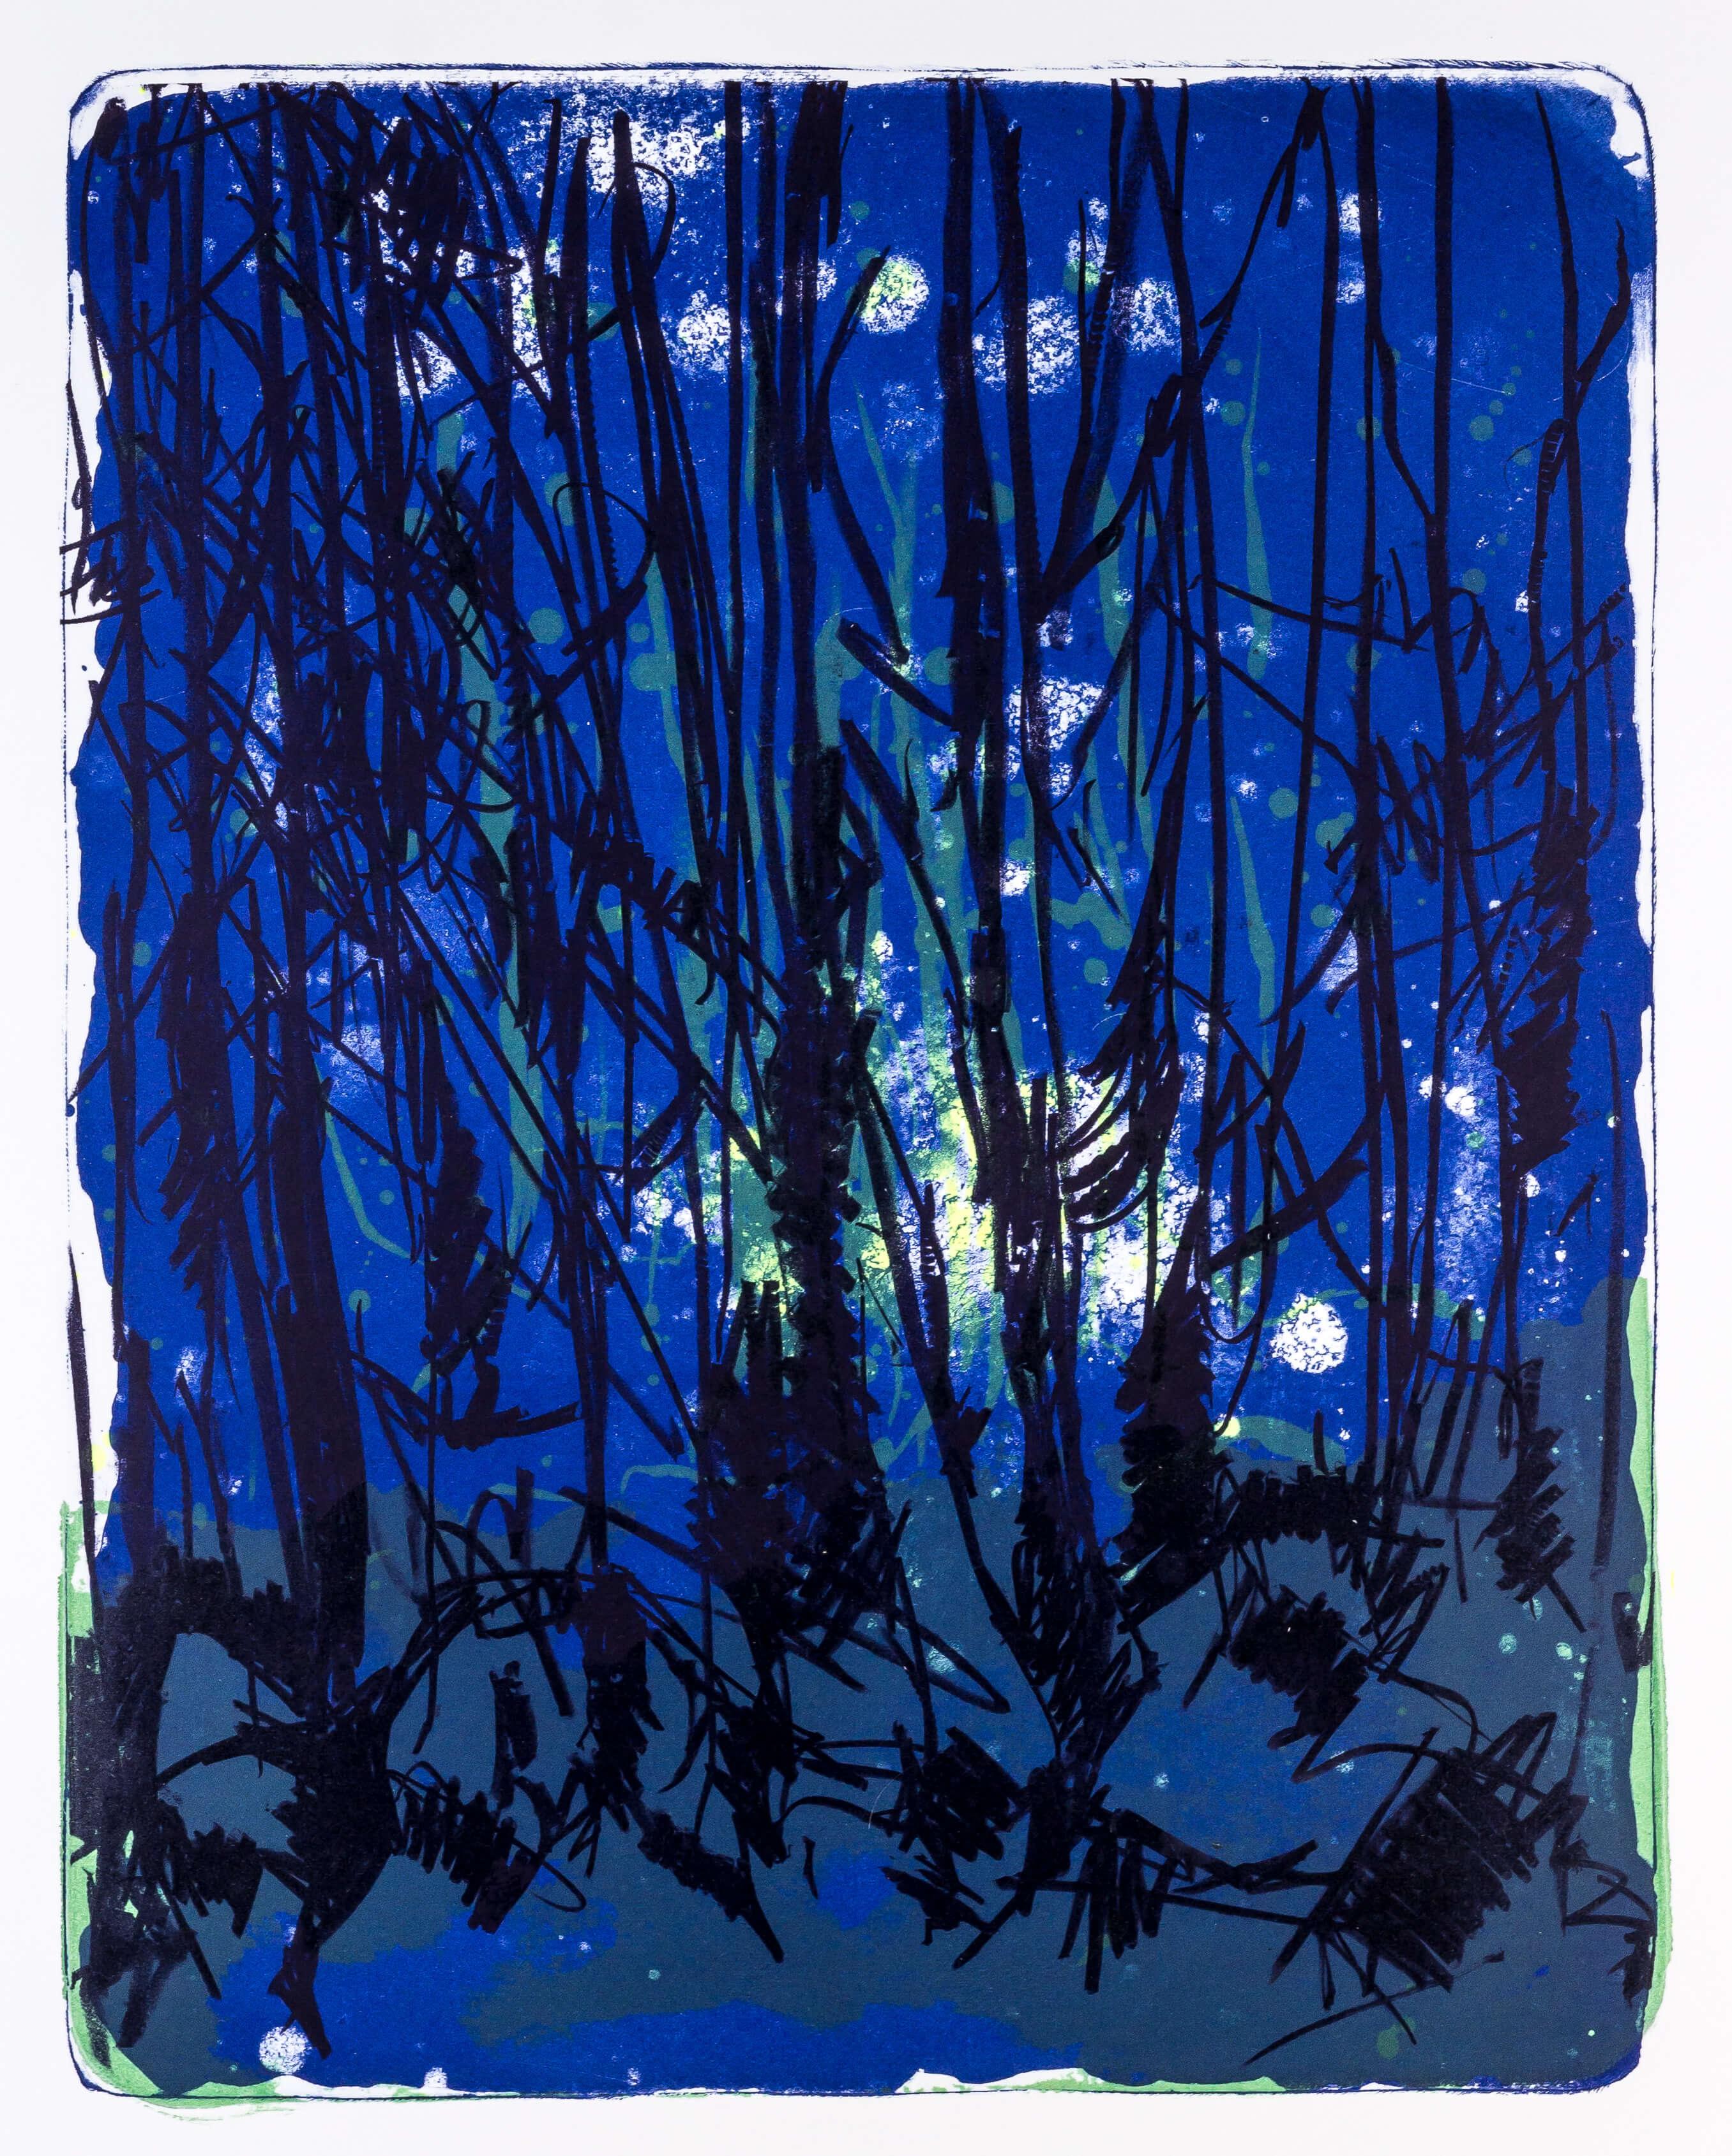 Katharina Albers, Wald X-XII, 2015, Farblithographie, Unikat, 50×40 cm